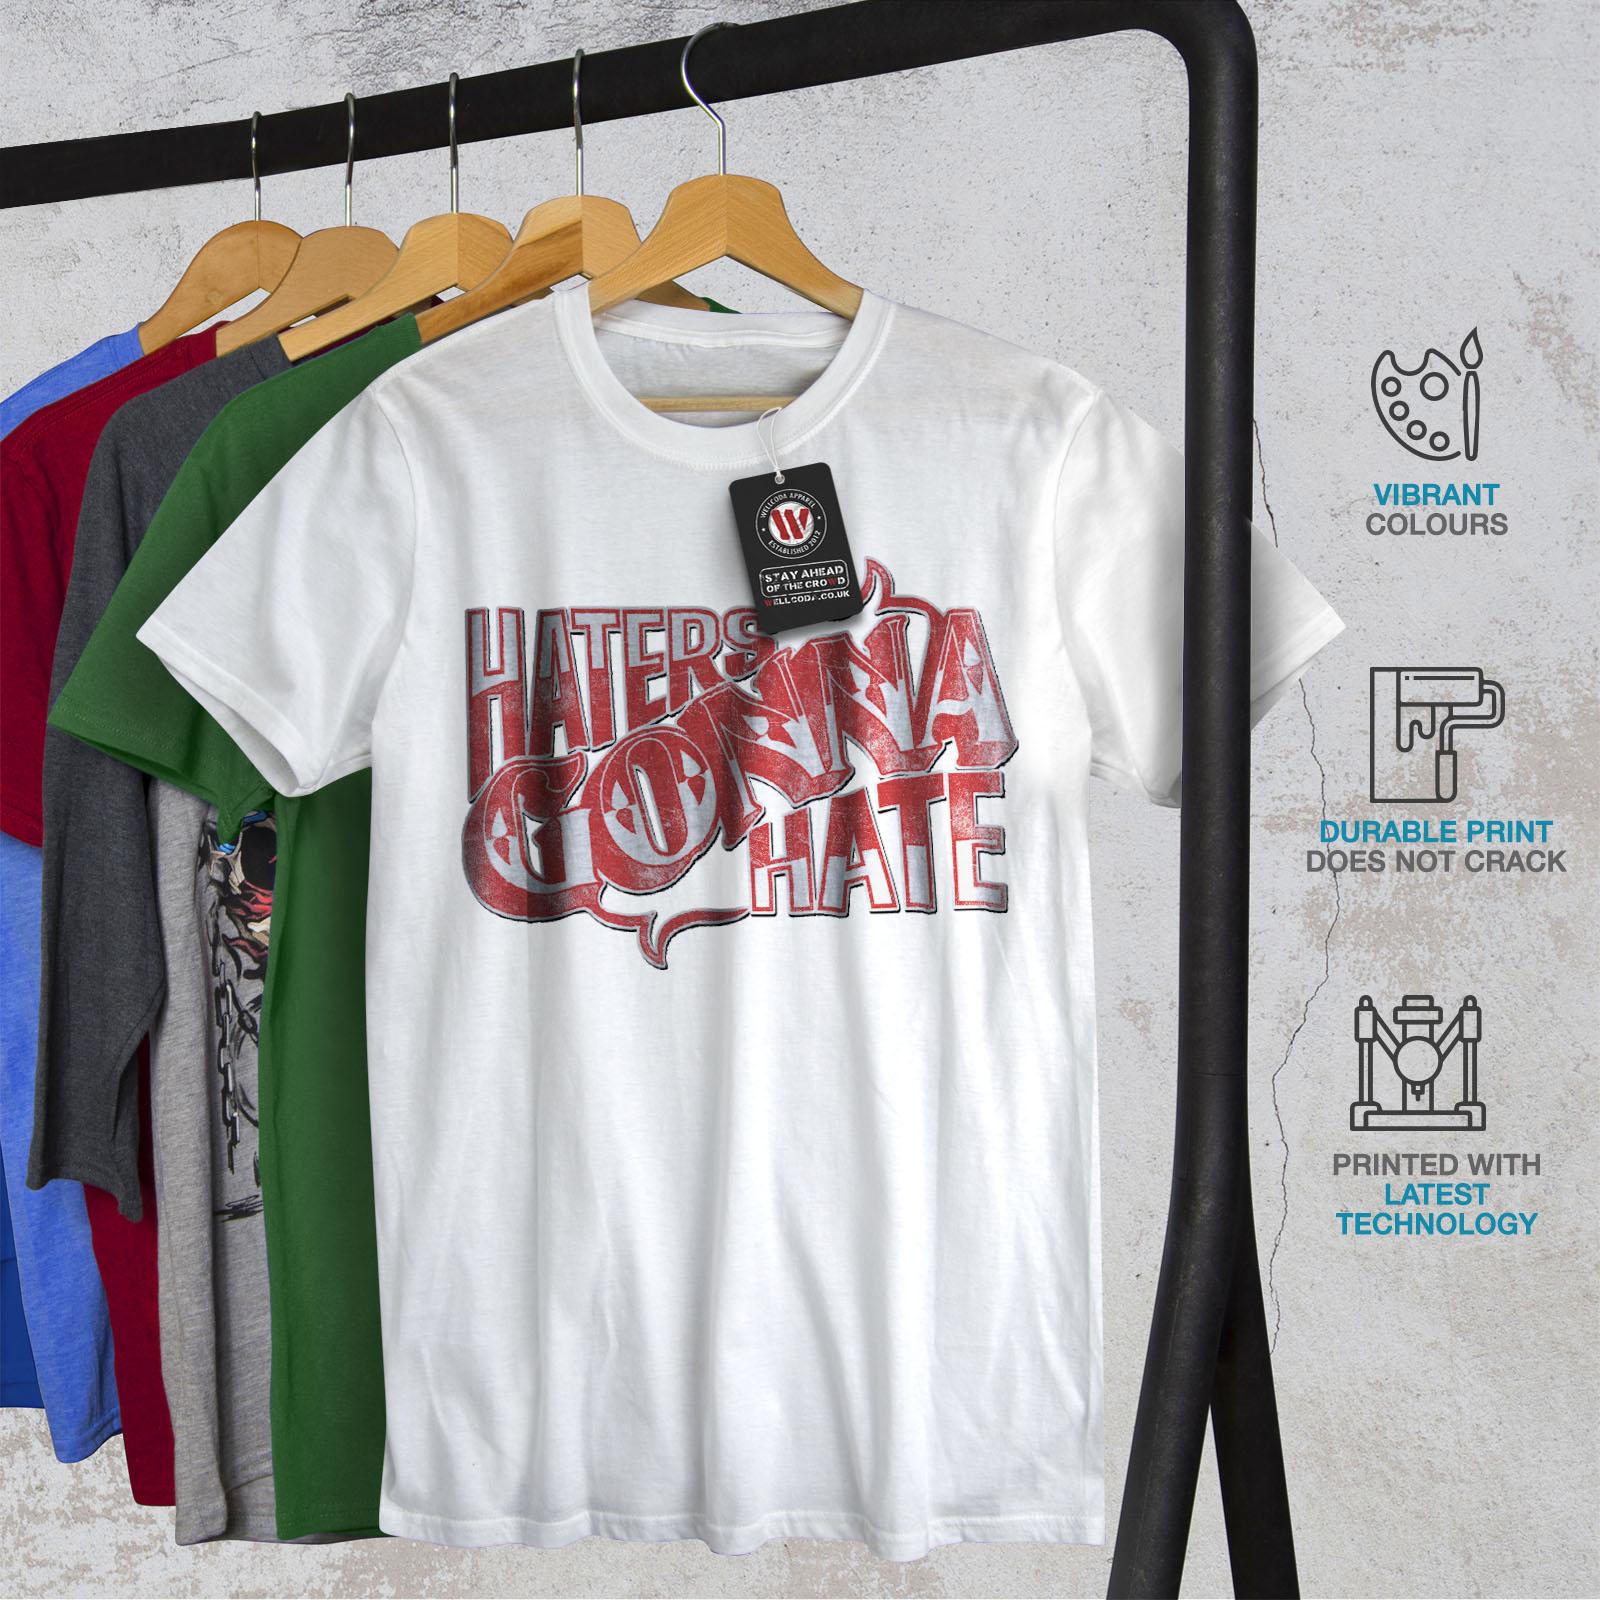 Wellcoda-Wasser-hassen-Zitat-Slogan-Herren-T-Shirt-True-Grafikdesign-Printed-Tee Indexbild 12